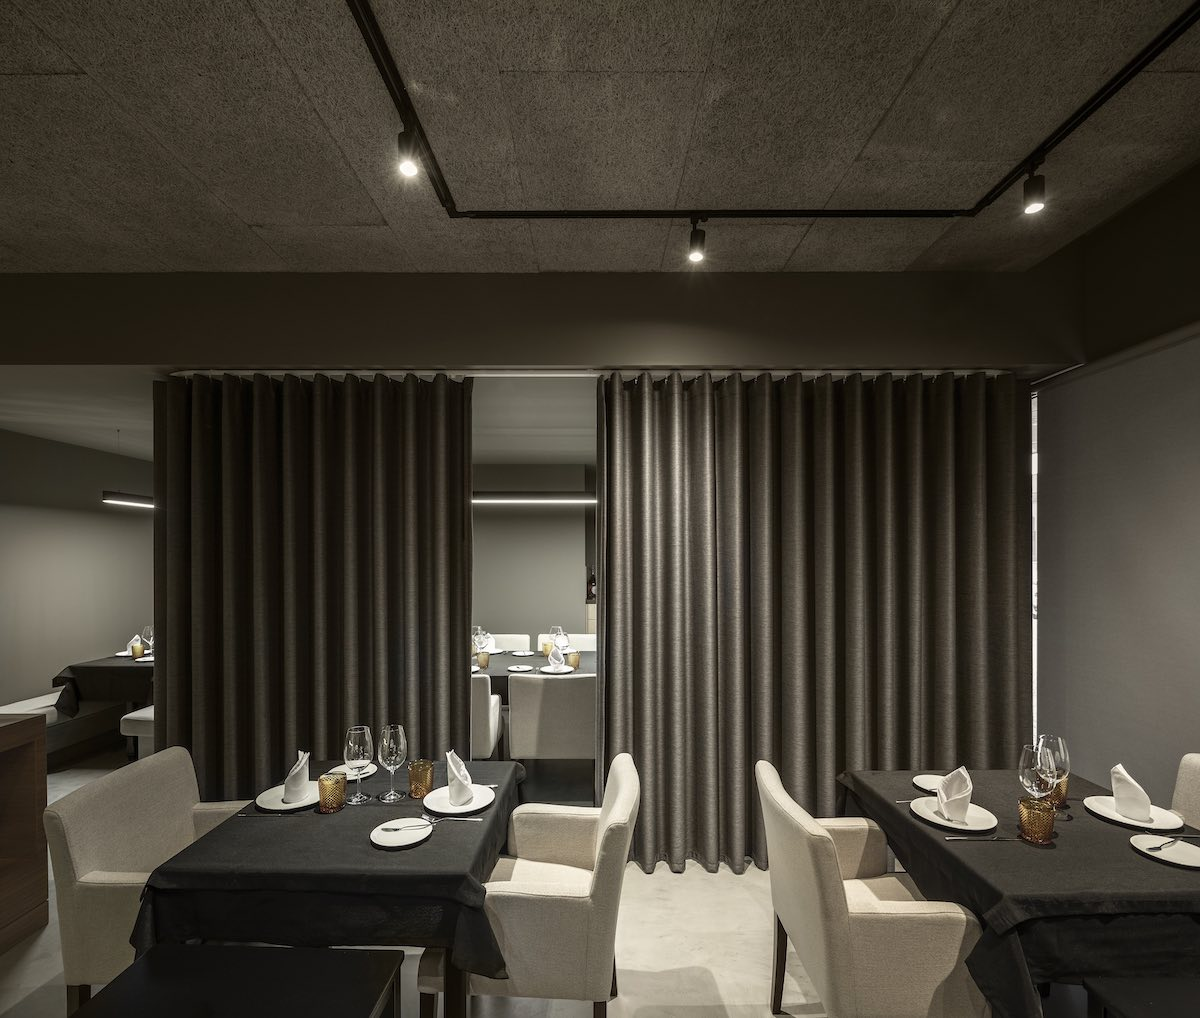 FAMA_Restaurant_Paulo_Martins_Arquitectura_and_design_AmazingArchitecture_%20006.jpg